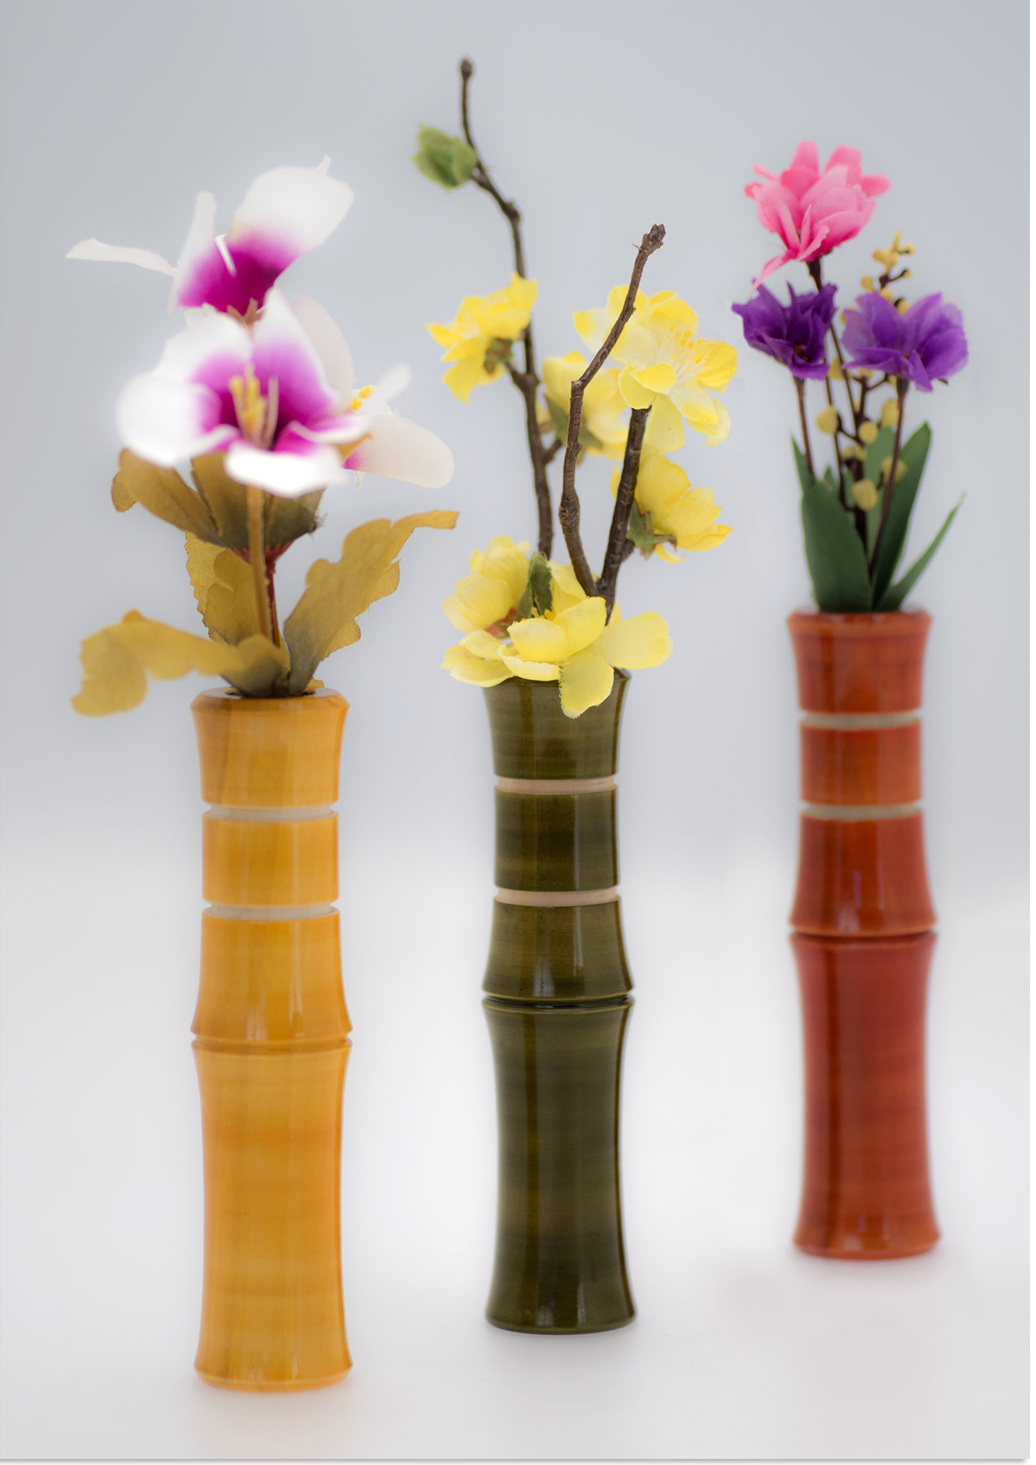 Liix Handlebar Vase